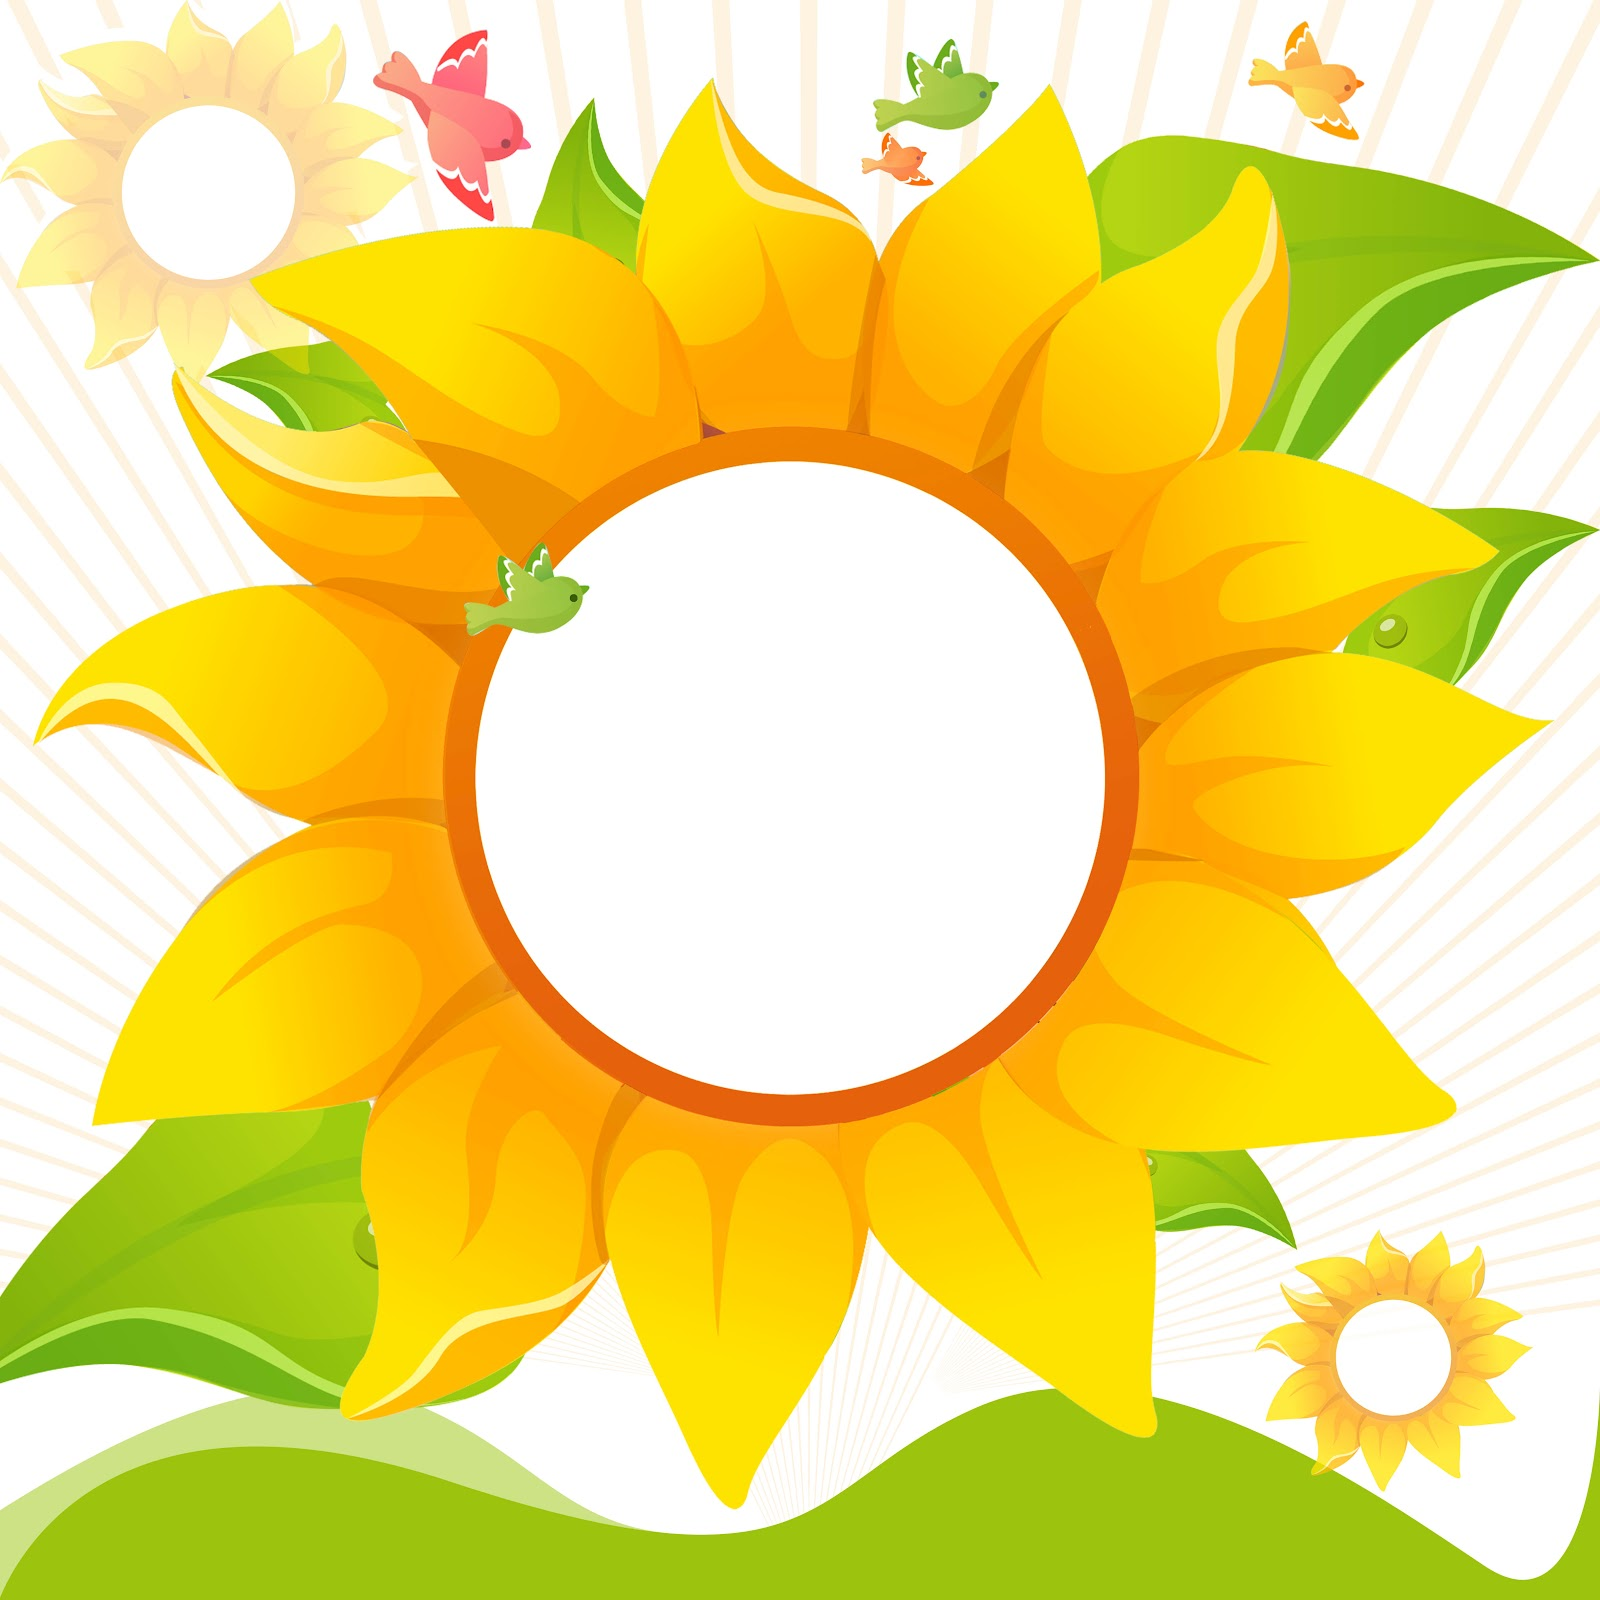 http://3.bp.blogspot.com/-3-IFMzQ08CM/T5ZaBCxp3YI/AAAAAAAAHRM/xPMJ3Qm9UeE/s1600/Plantilla+Girasol_001.jpg